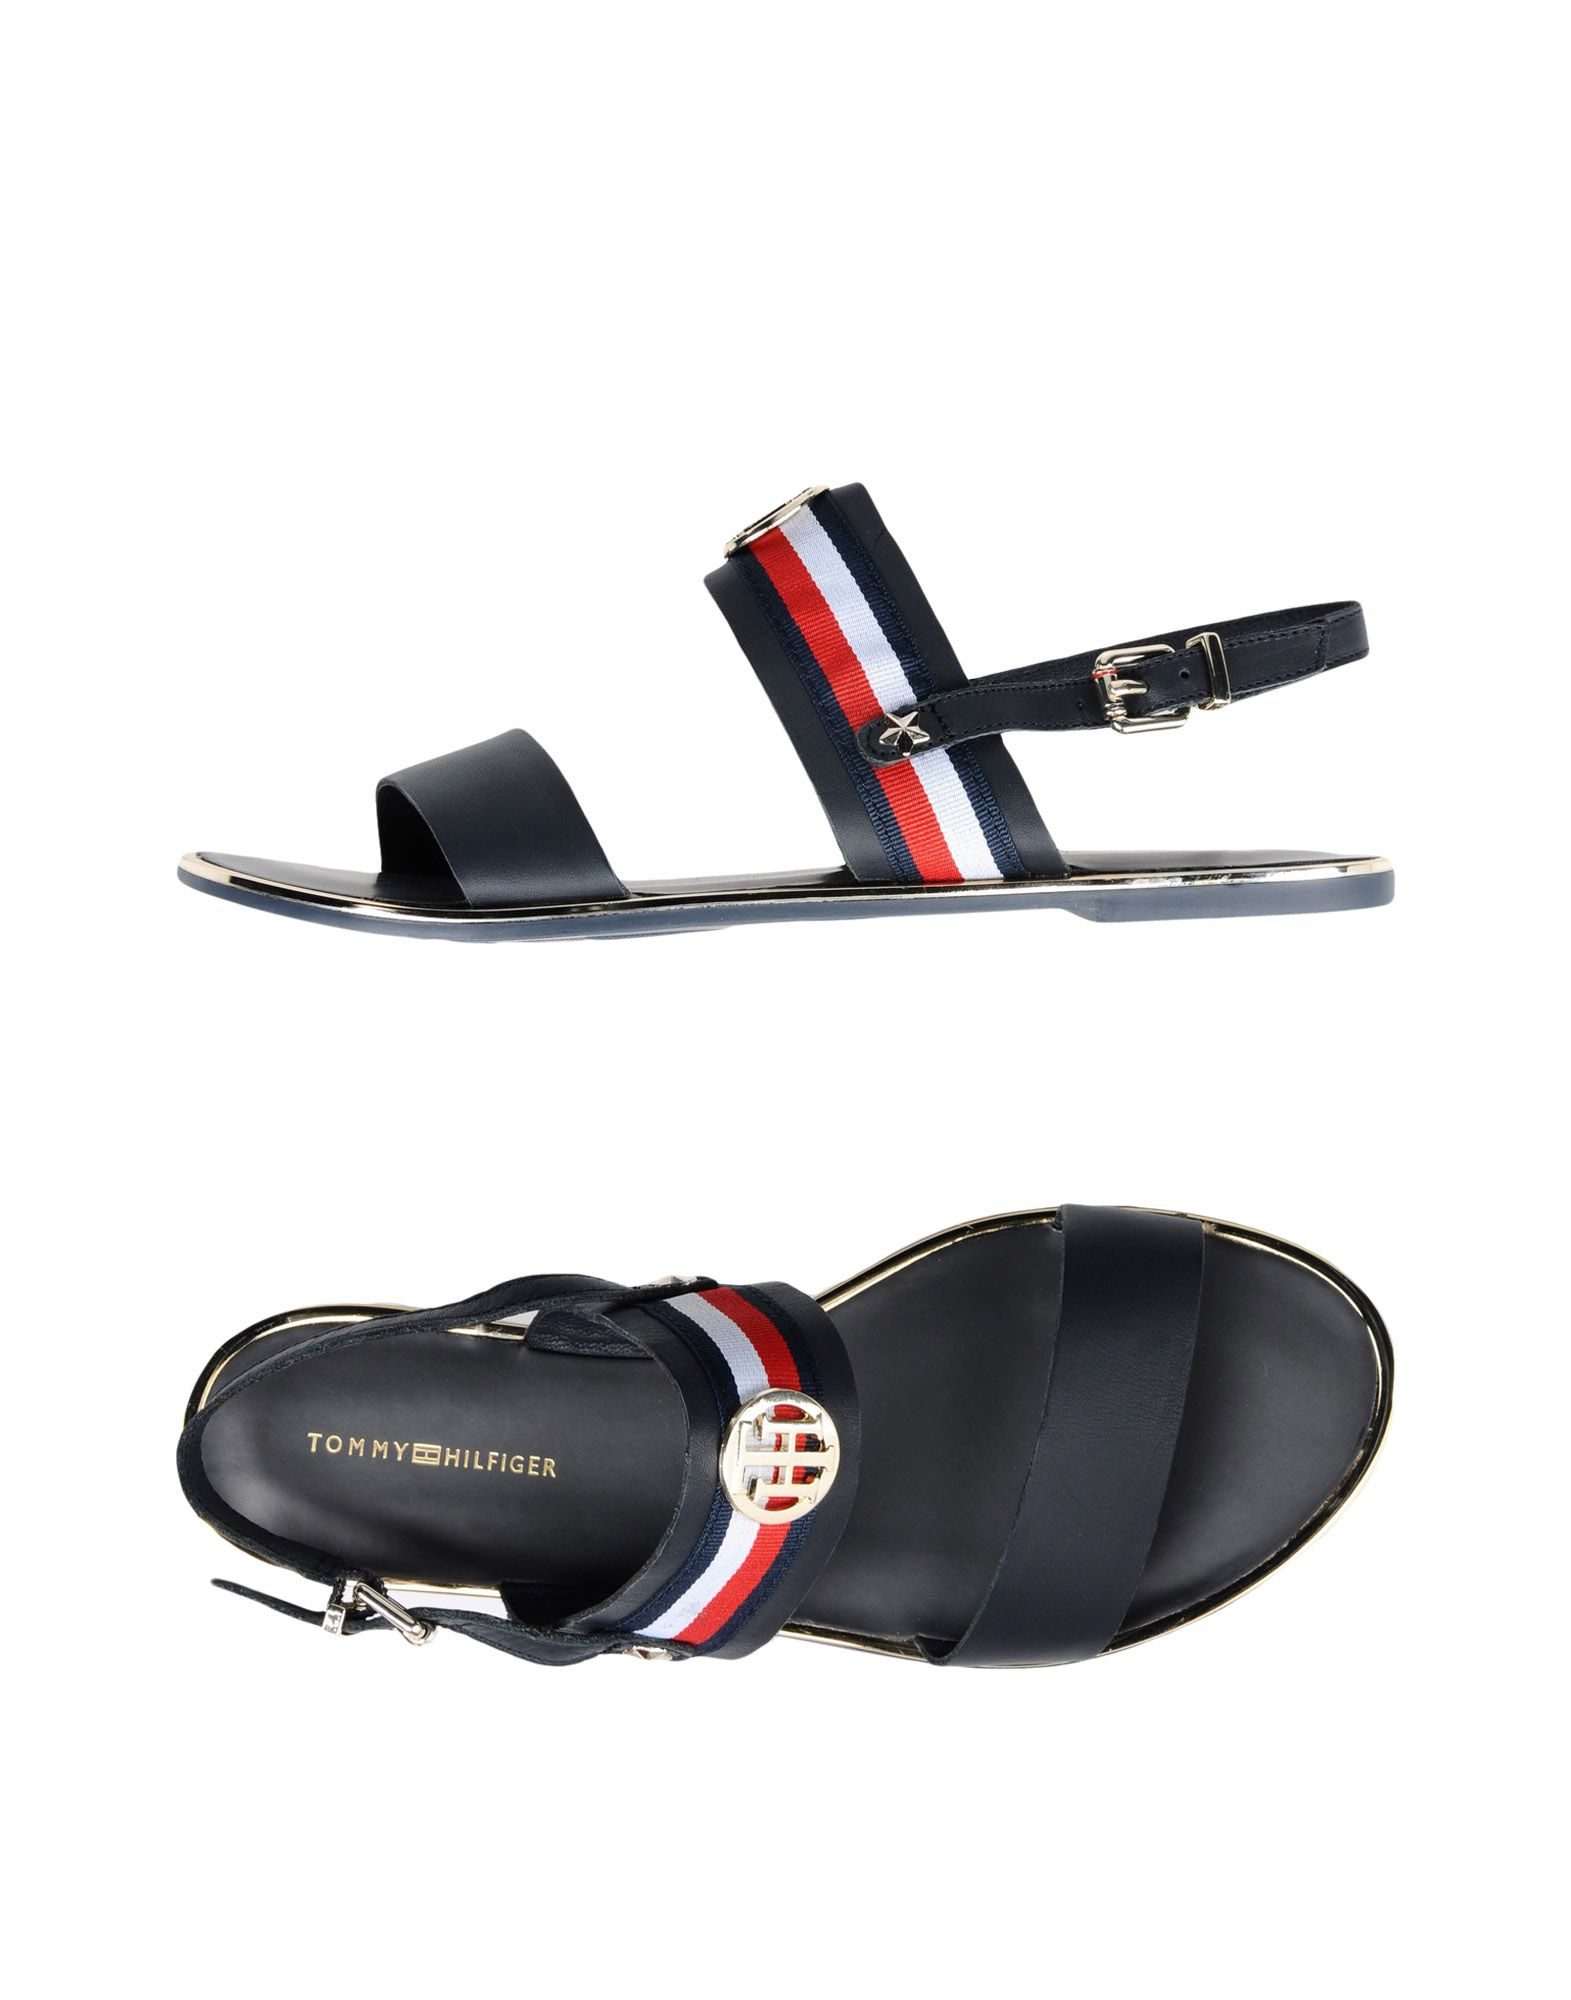 Sandales Tommy Hilfiger Corporate Ribbon Flat Sandal - Femme - Sandales Tommy Hilfiger sur